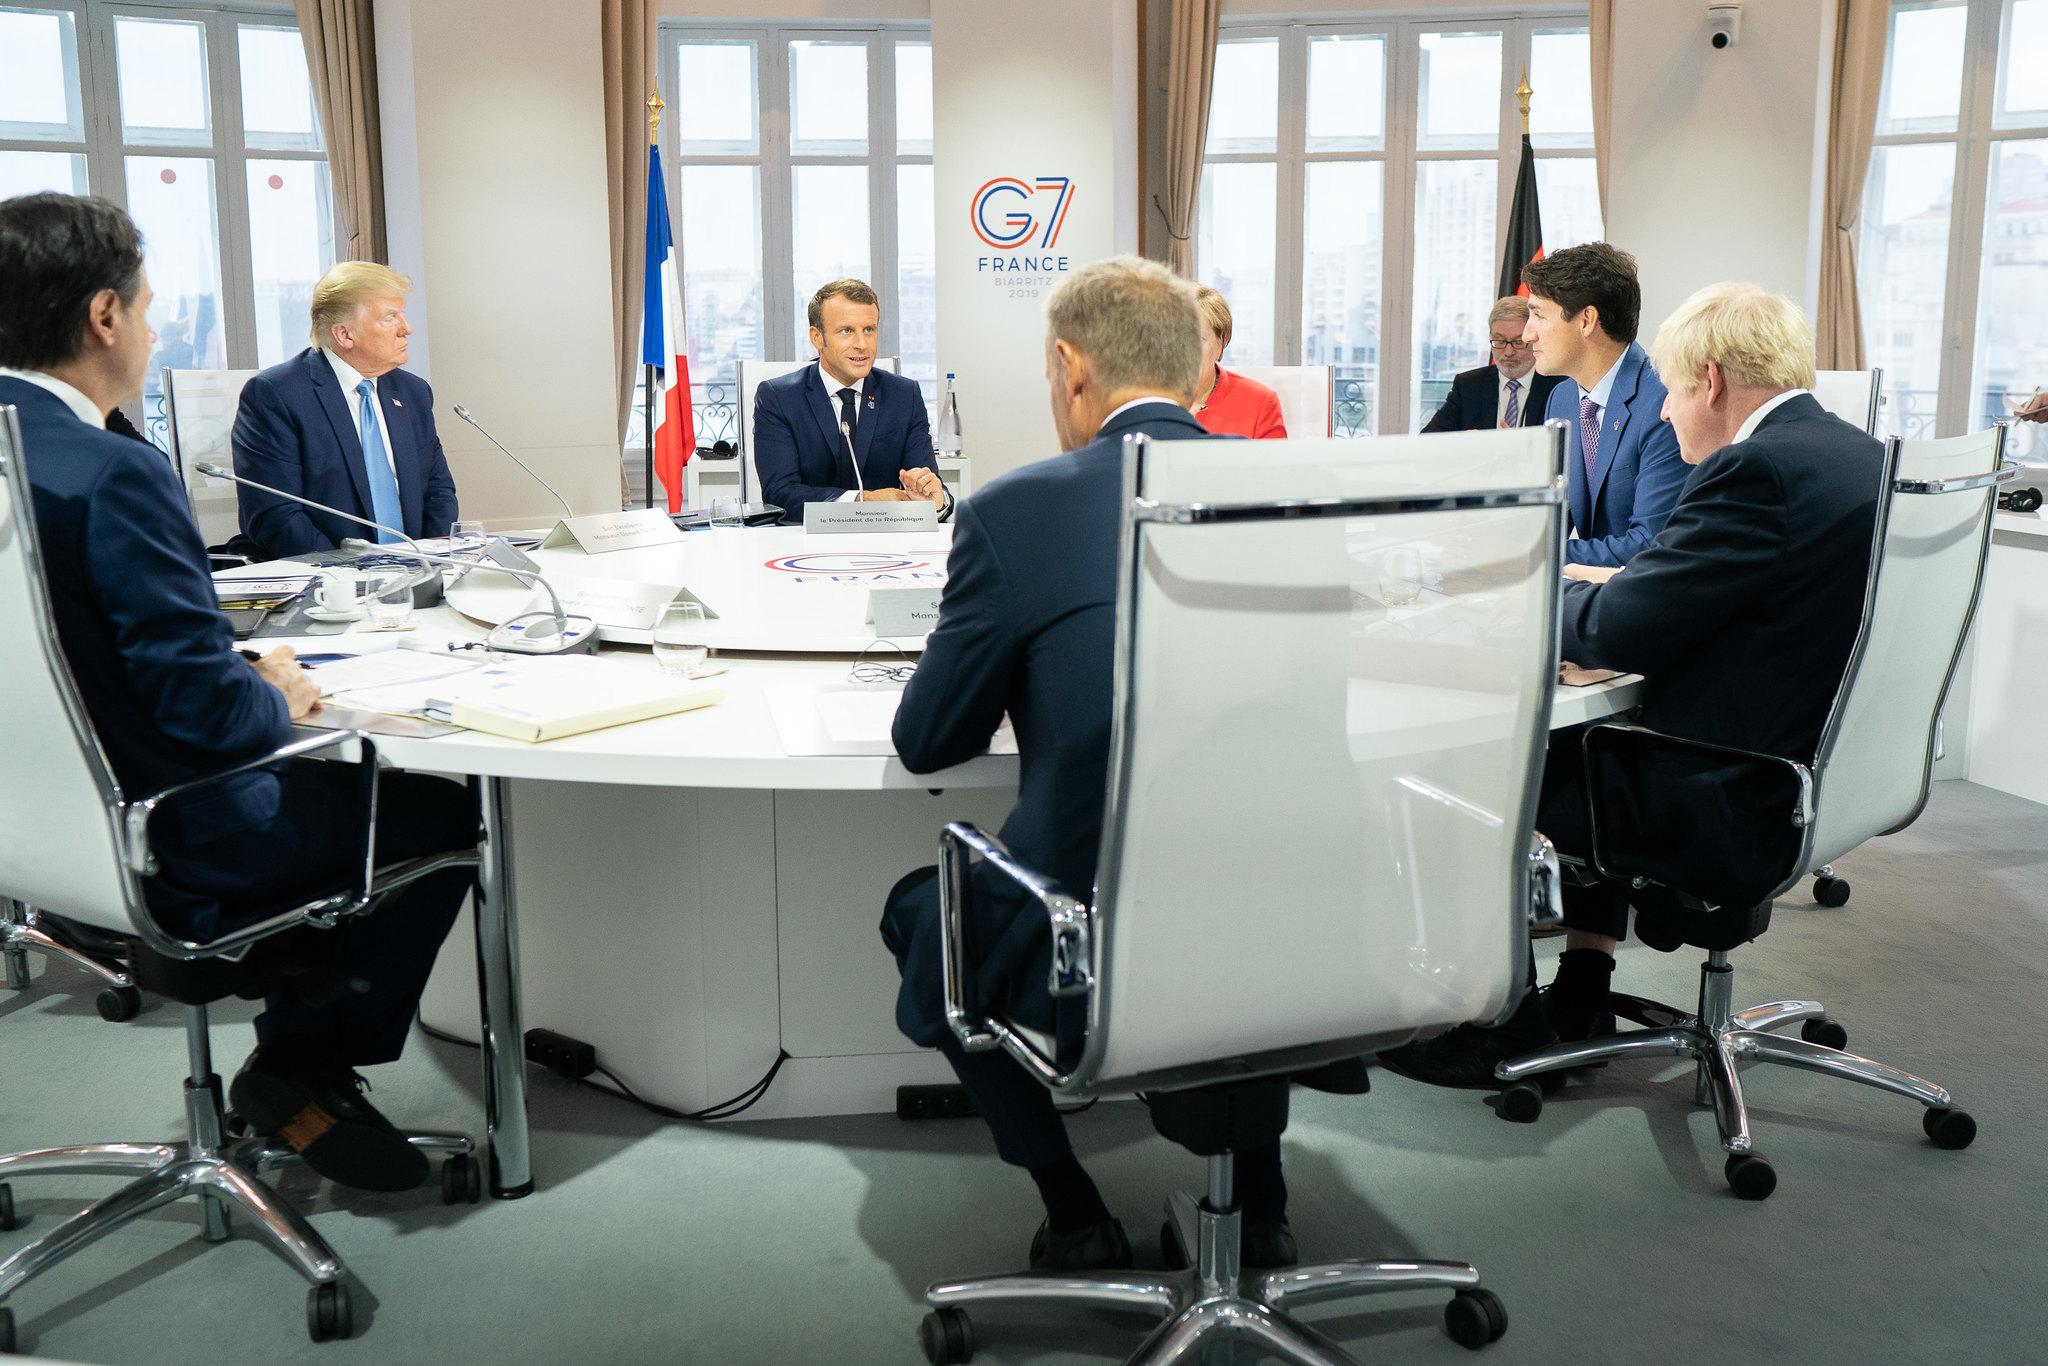 G7促遵守中英聯合聲明承諾 中國:任何國家無權干涉(圖/美國白宮 Flickr/公共領域)